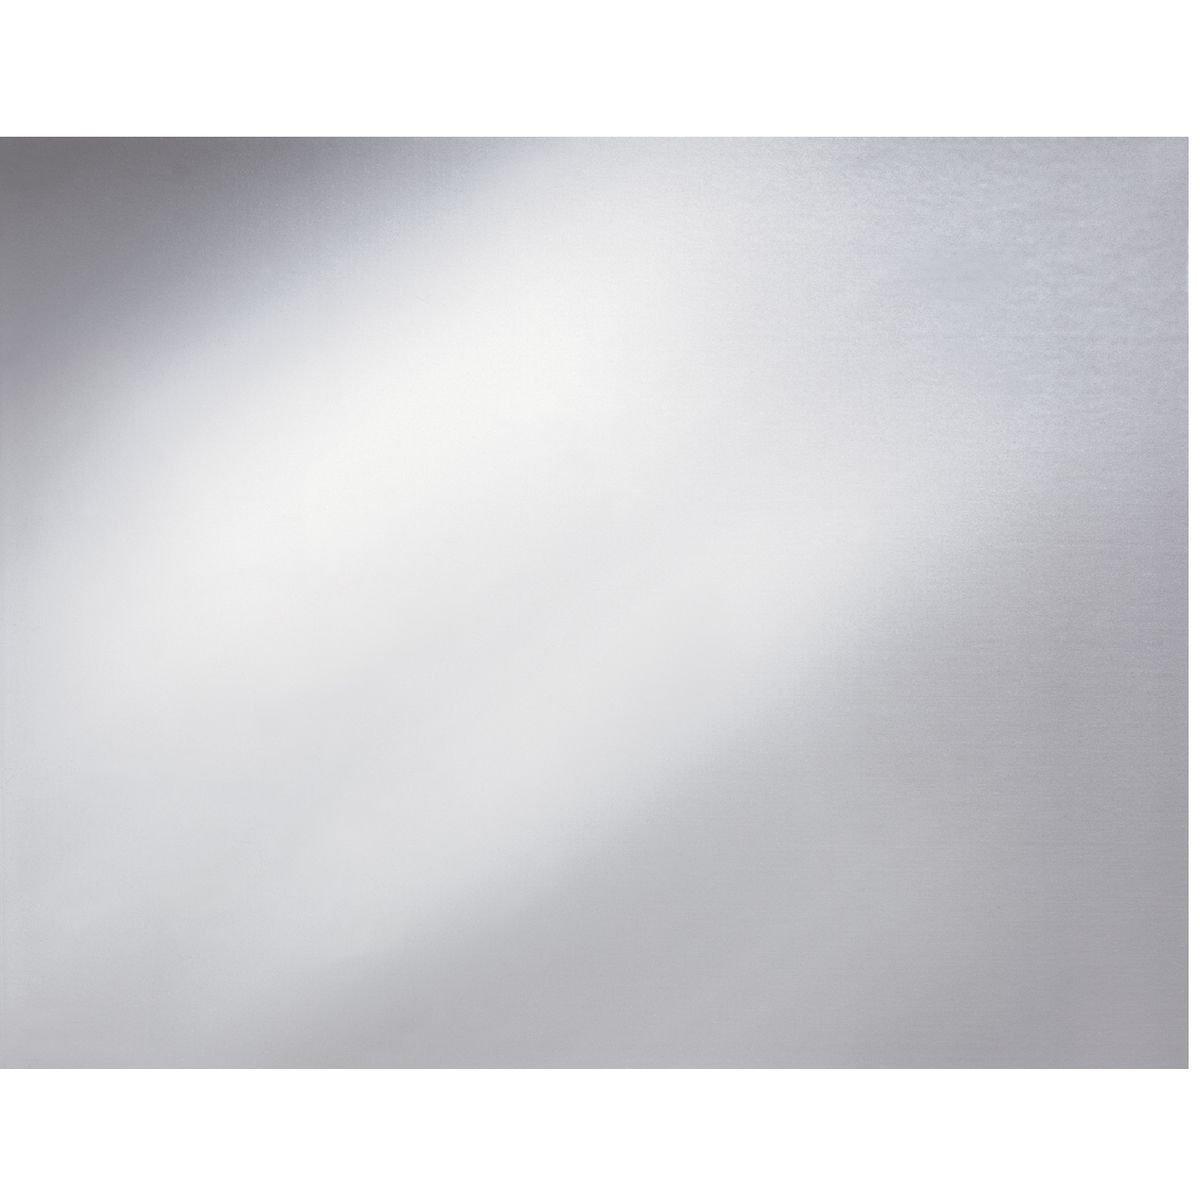 Amazon d c fix F Klebefolie Vinyl transparent 200 x